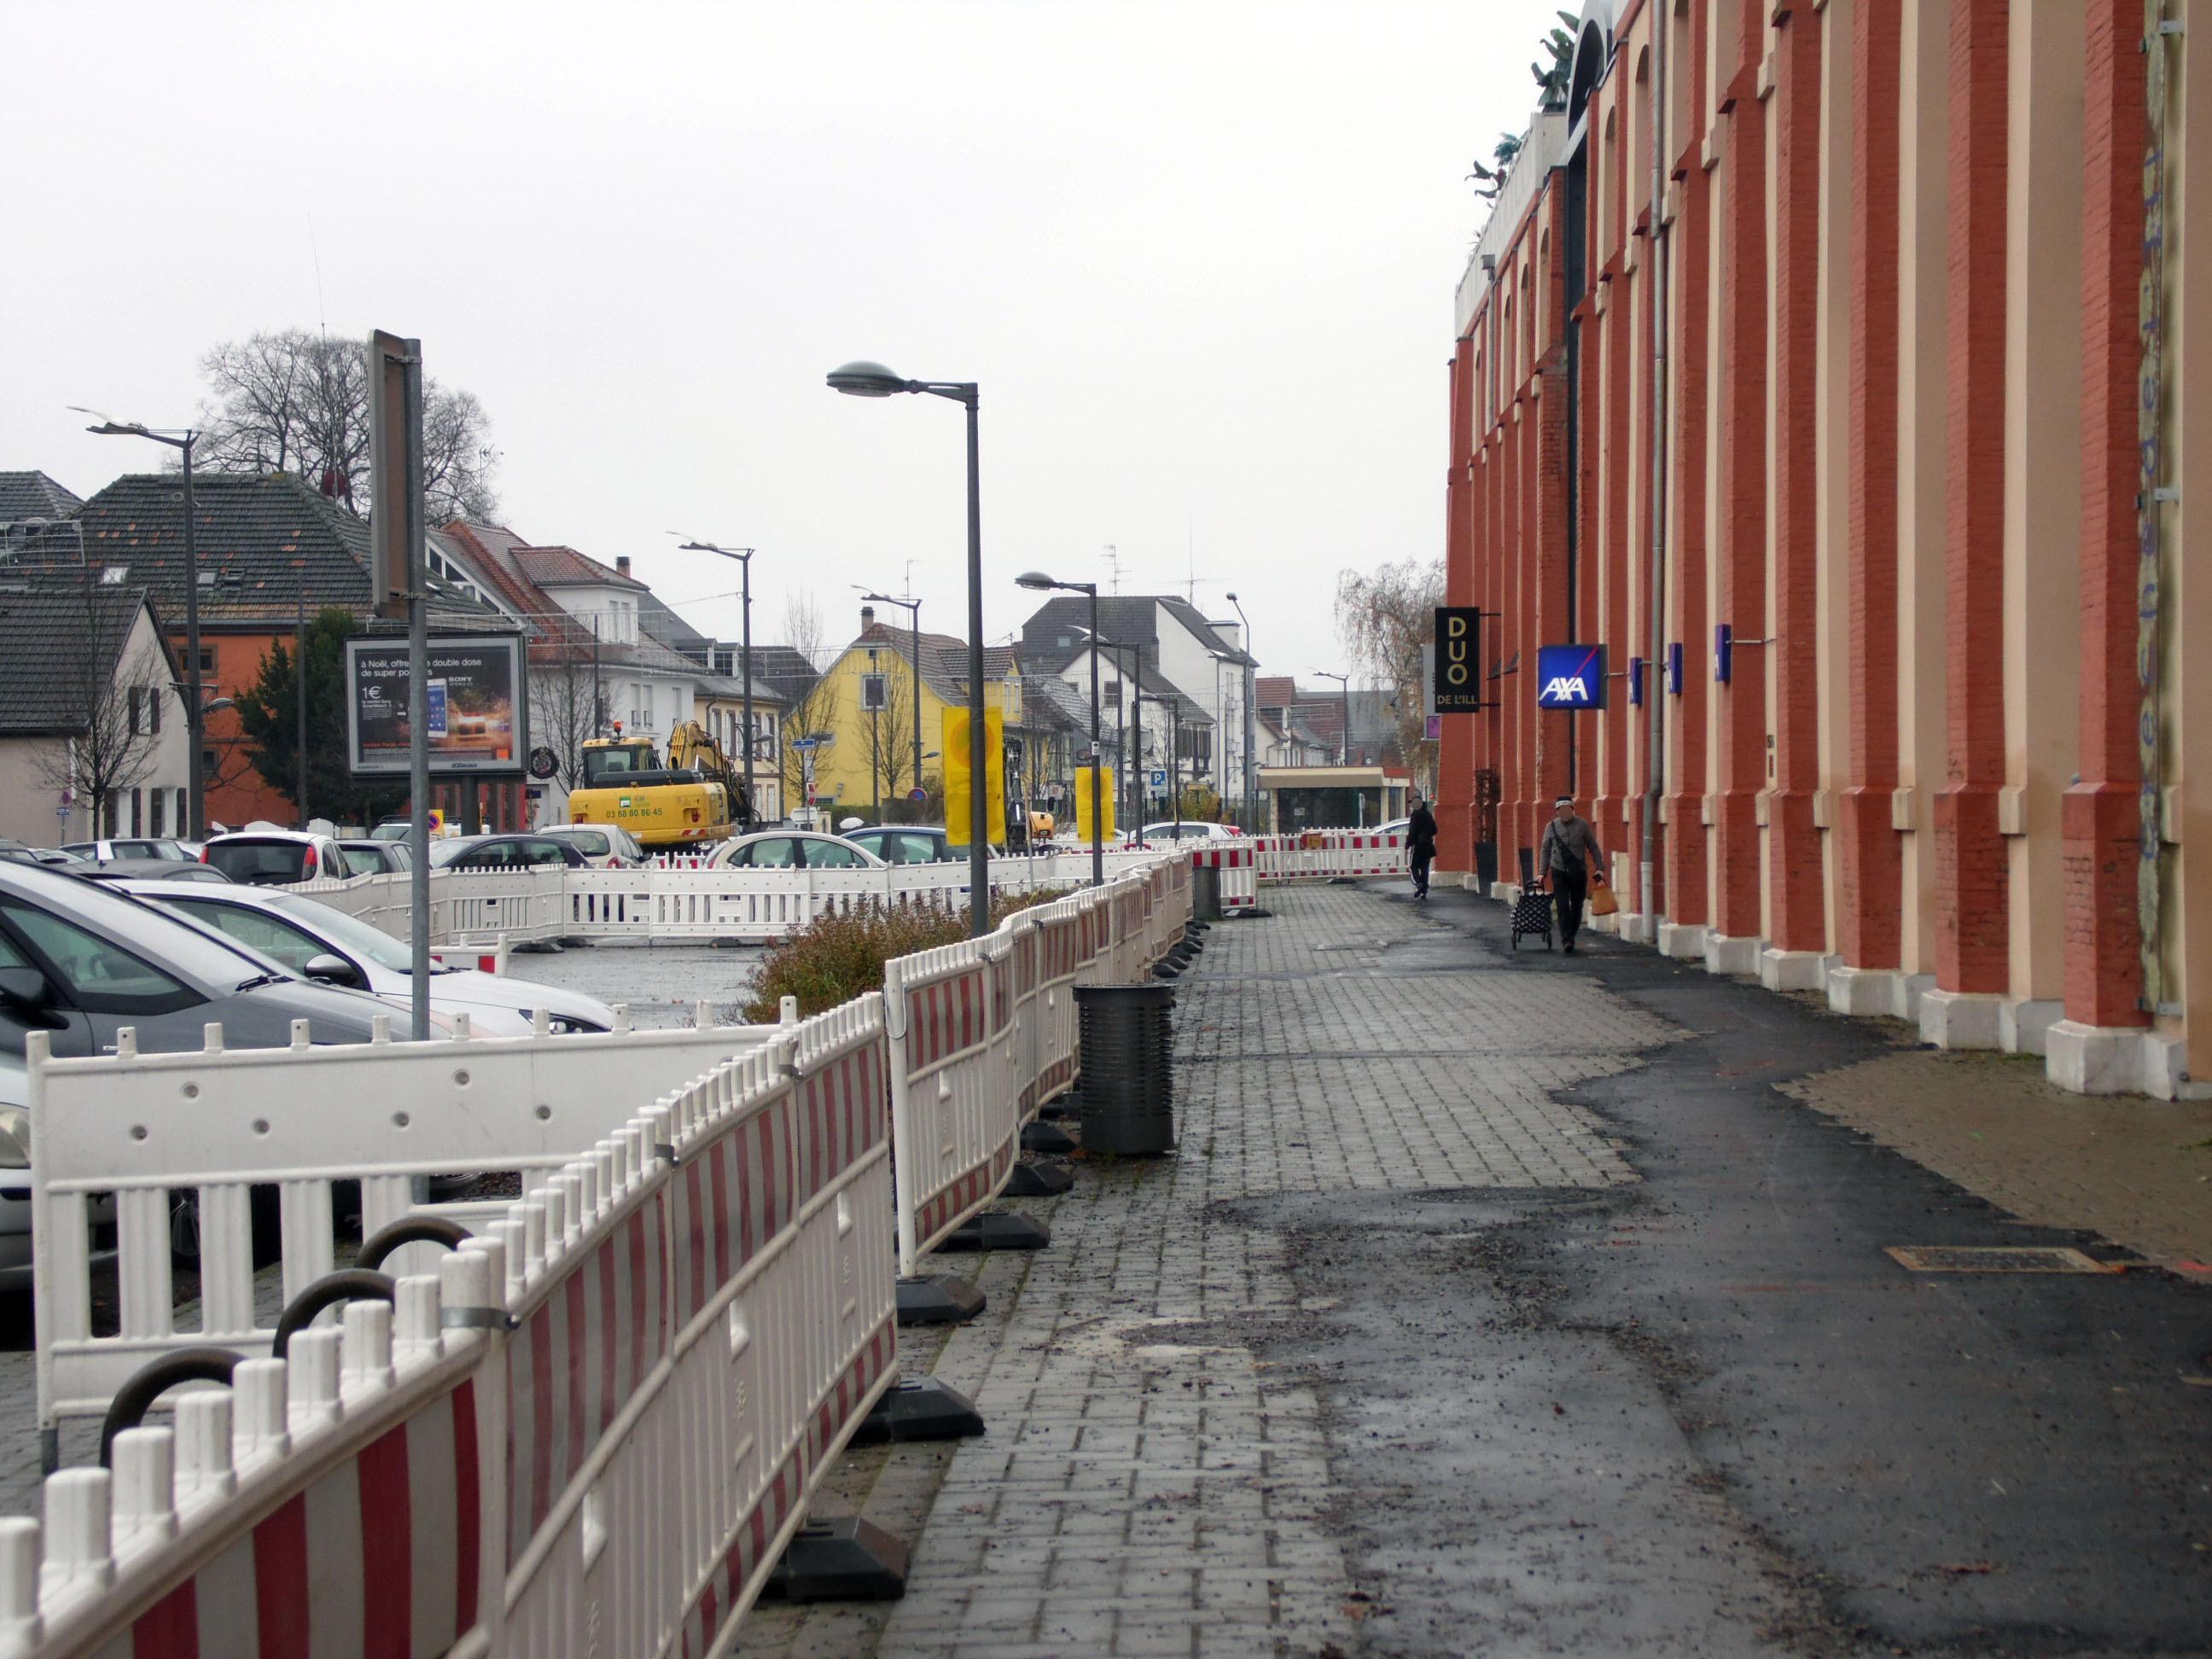 file travaux tram a parc stationnement route lyon illkirch graffenstaden. Black Bedroom Furniture Sets. Home Design Ideas